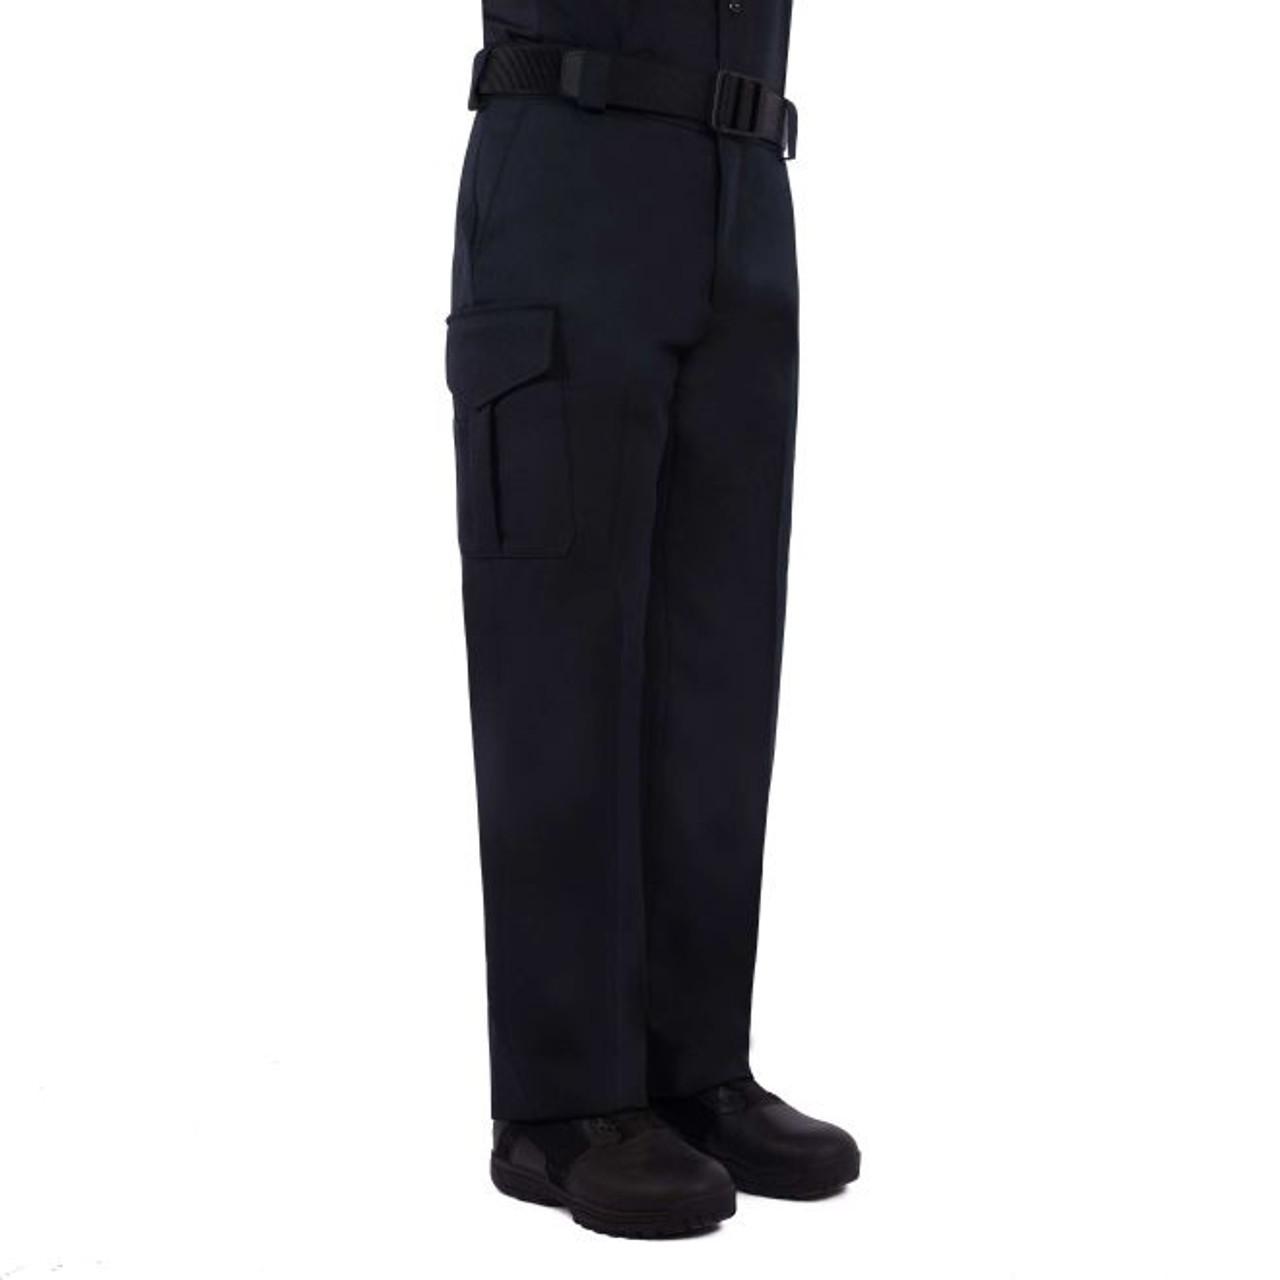 SIDE-POCKET POLYESTER PANTS